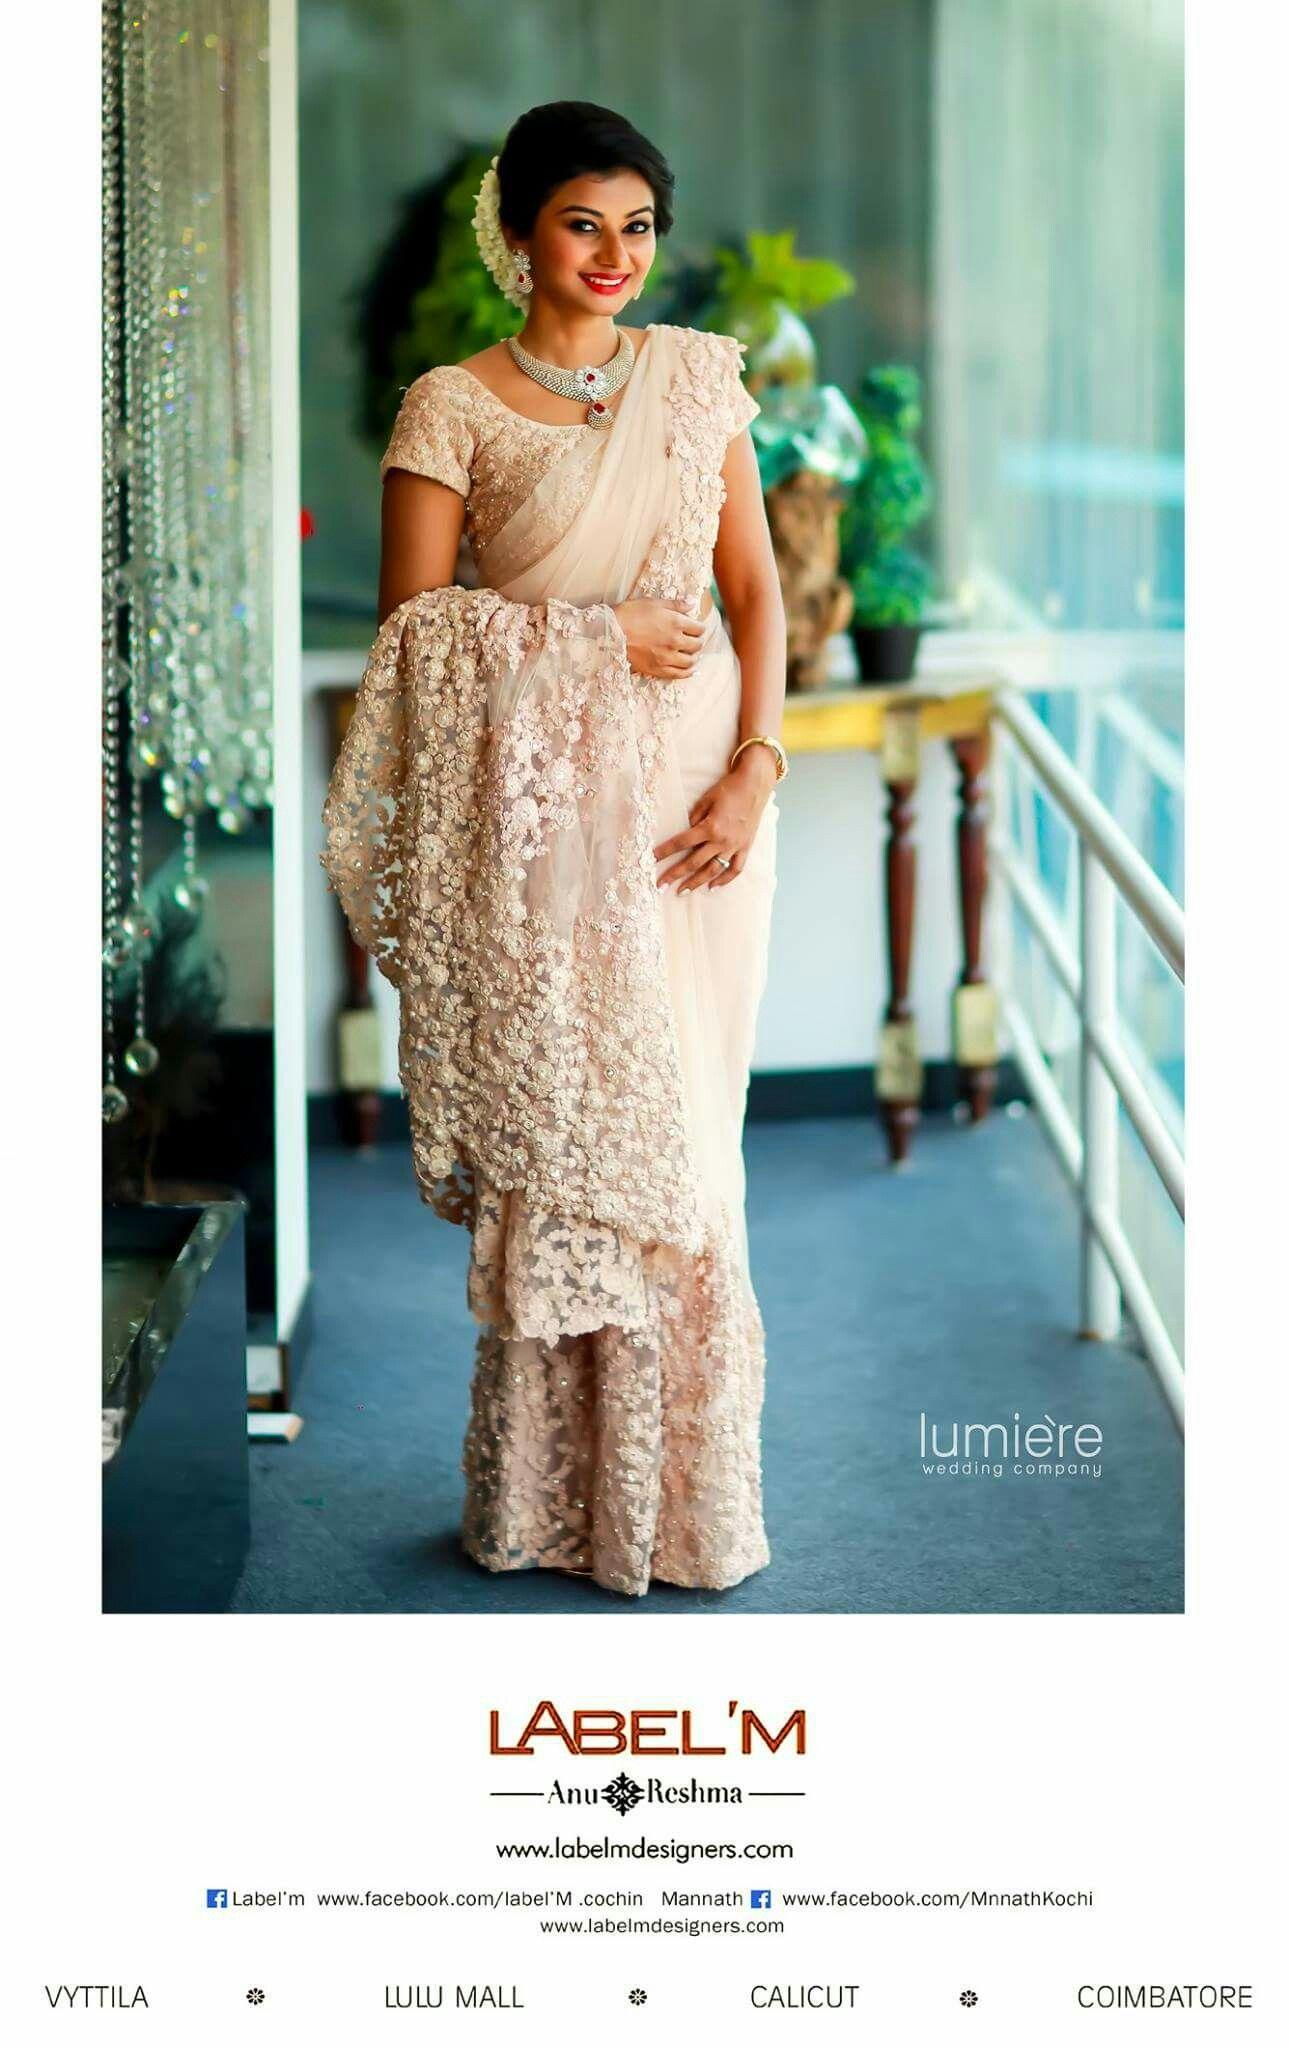 Pin von Alphonsa Thomas auf Kerala bride | Pinterest